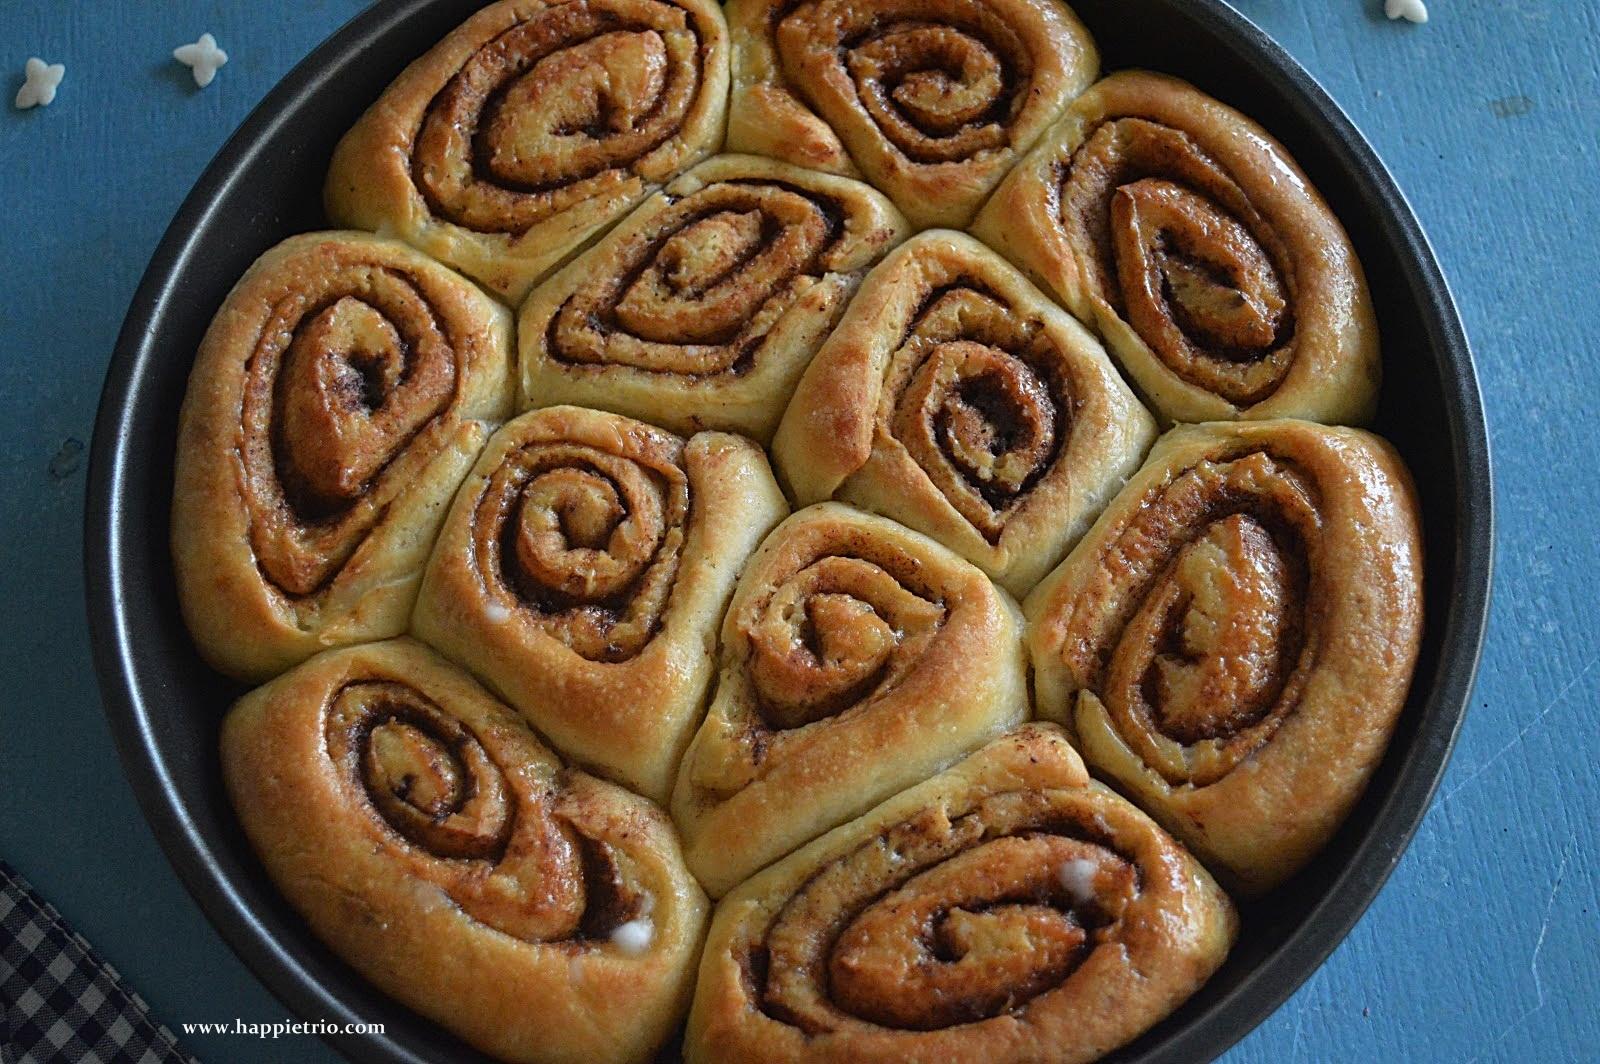 Eggless Cinnamon Rolls Recipe | How to prepare Cinnamon Rolls